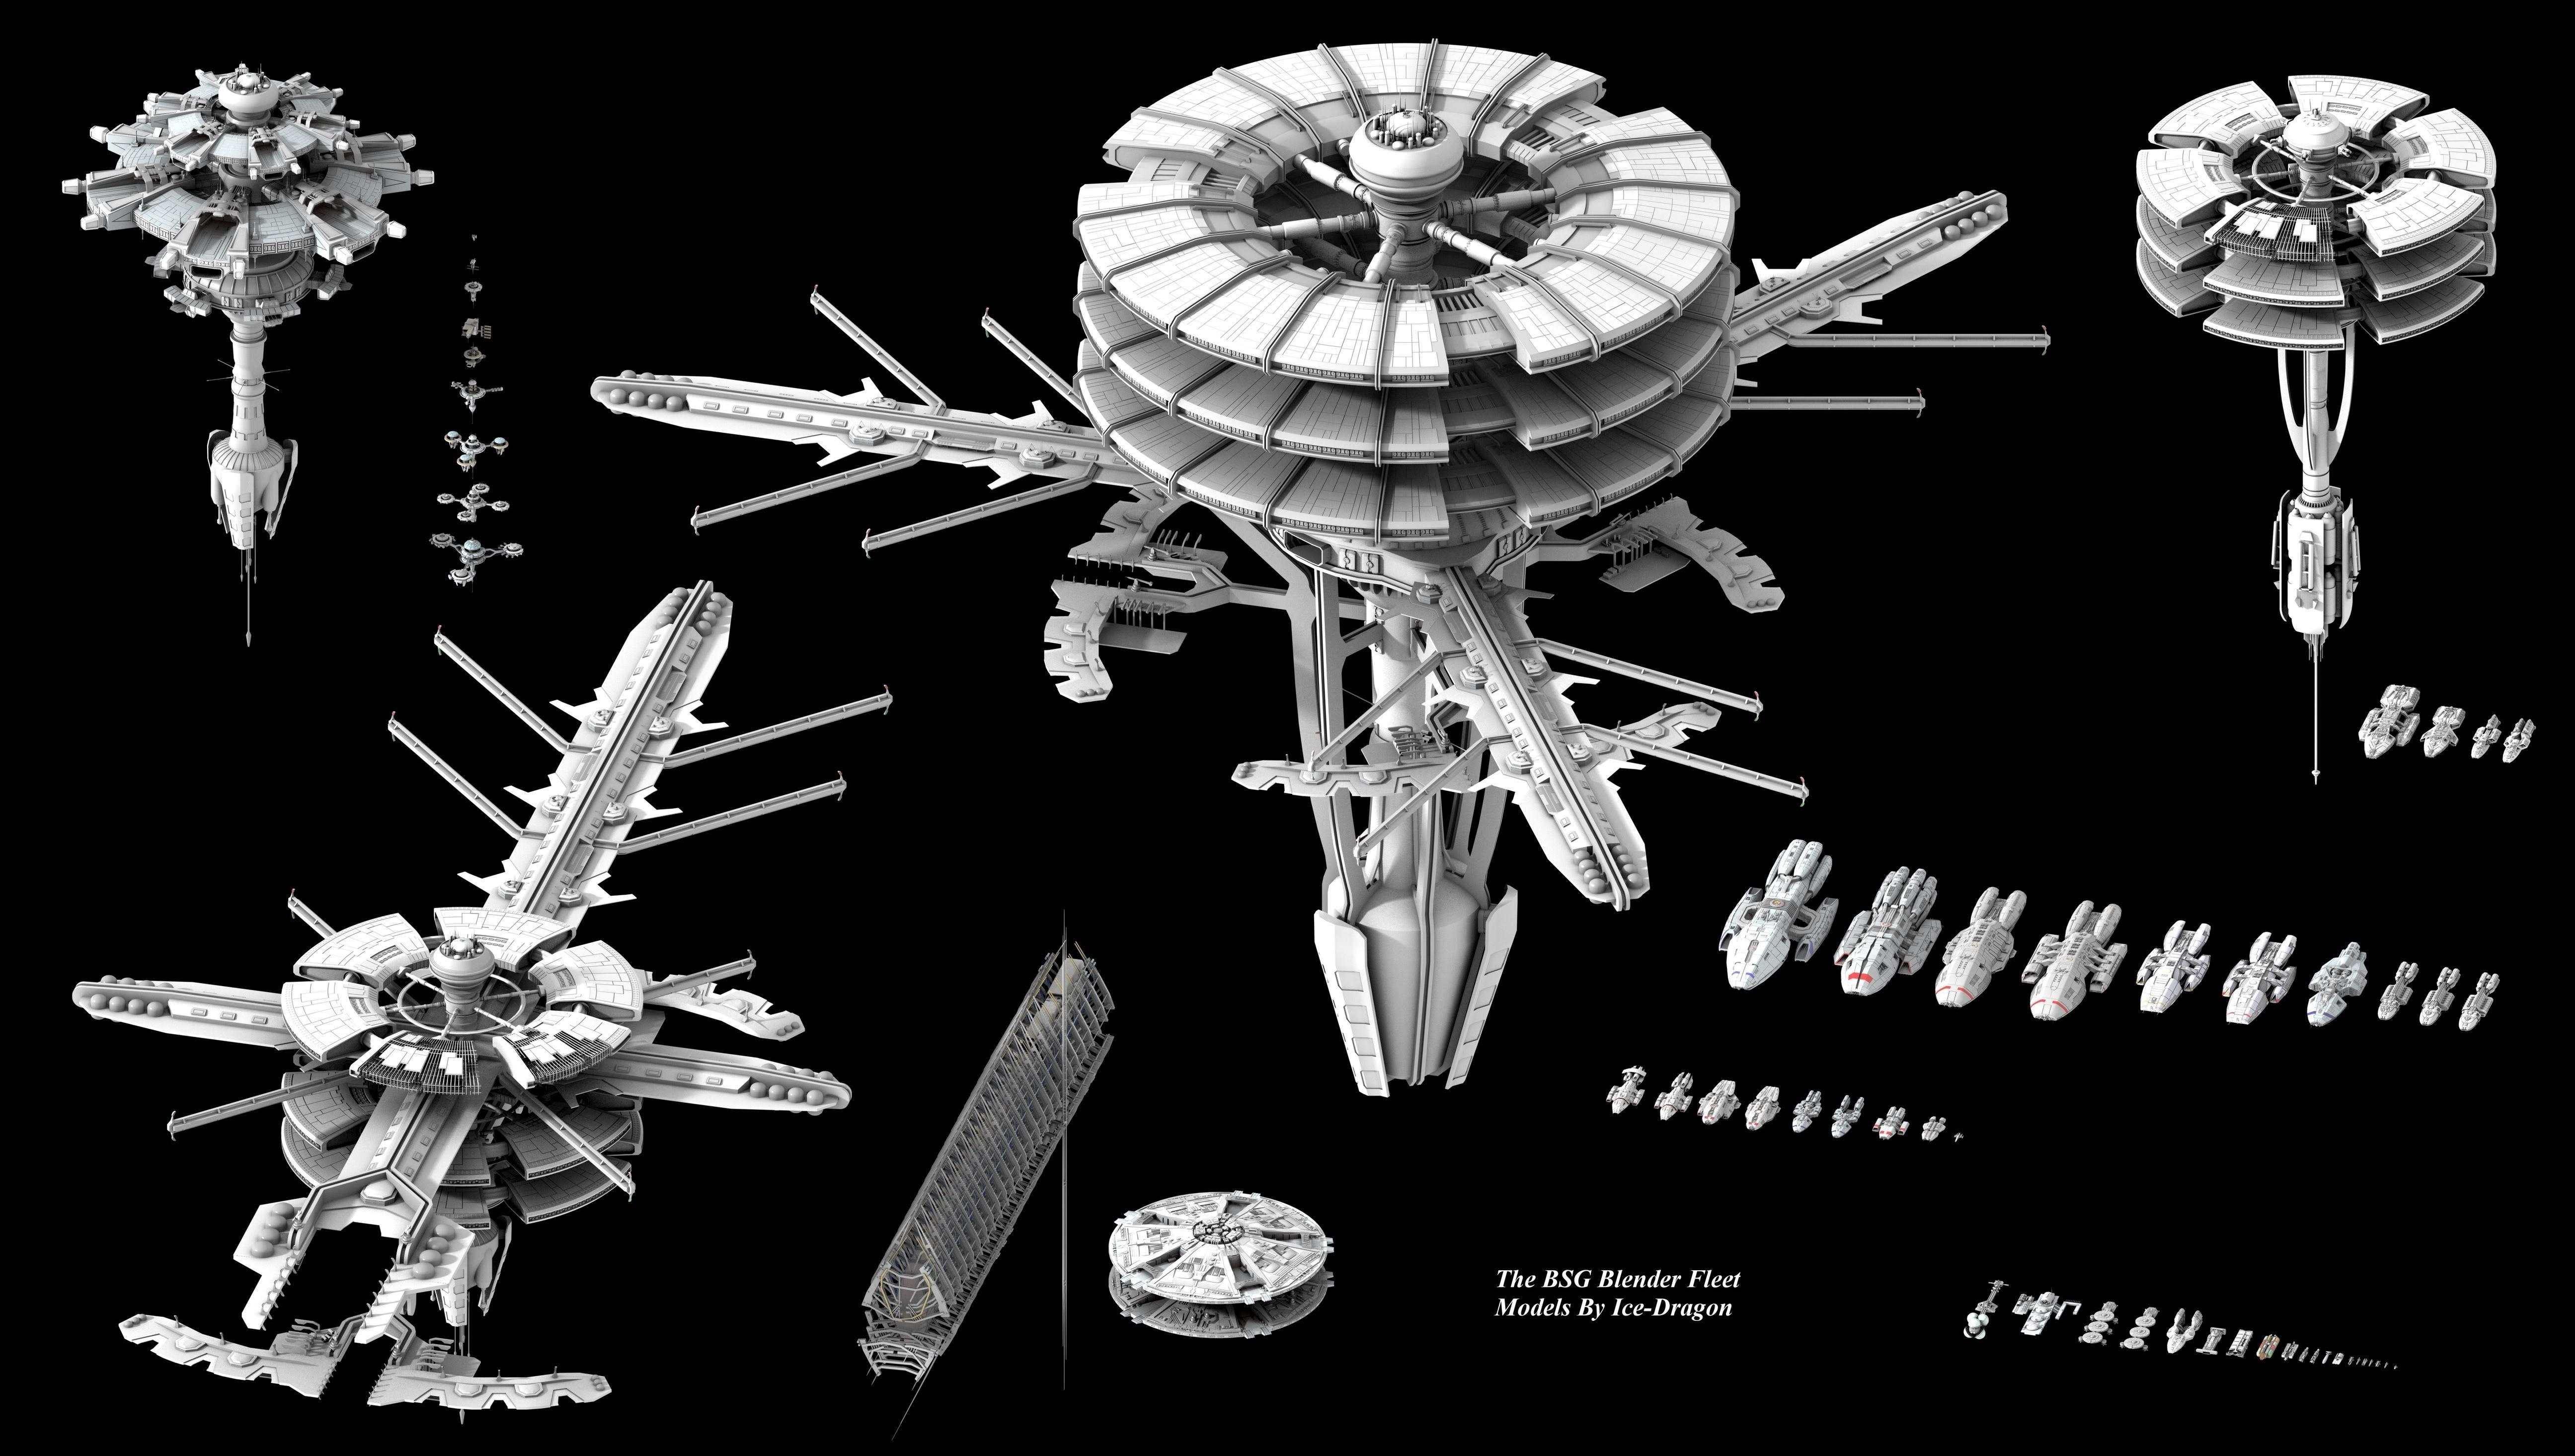 10687985_762819180431649_7620841305929268566_o.jpg 2,048 ...  |Battlestar Galactica Spacecraft